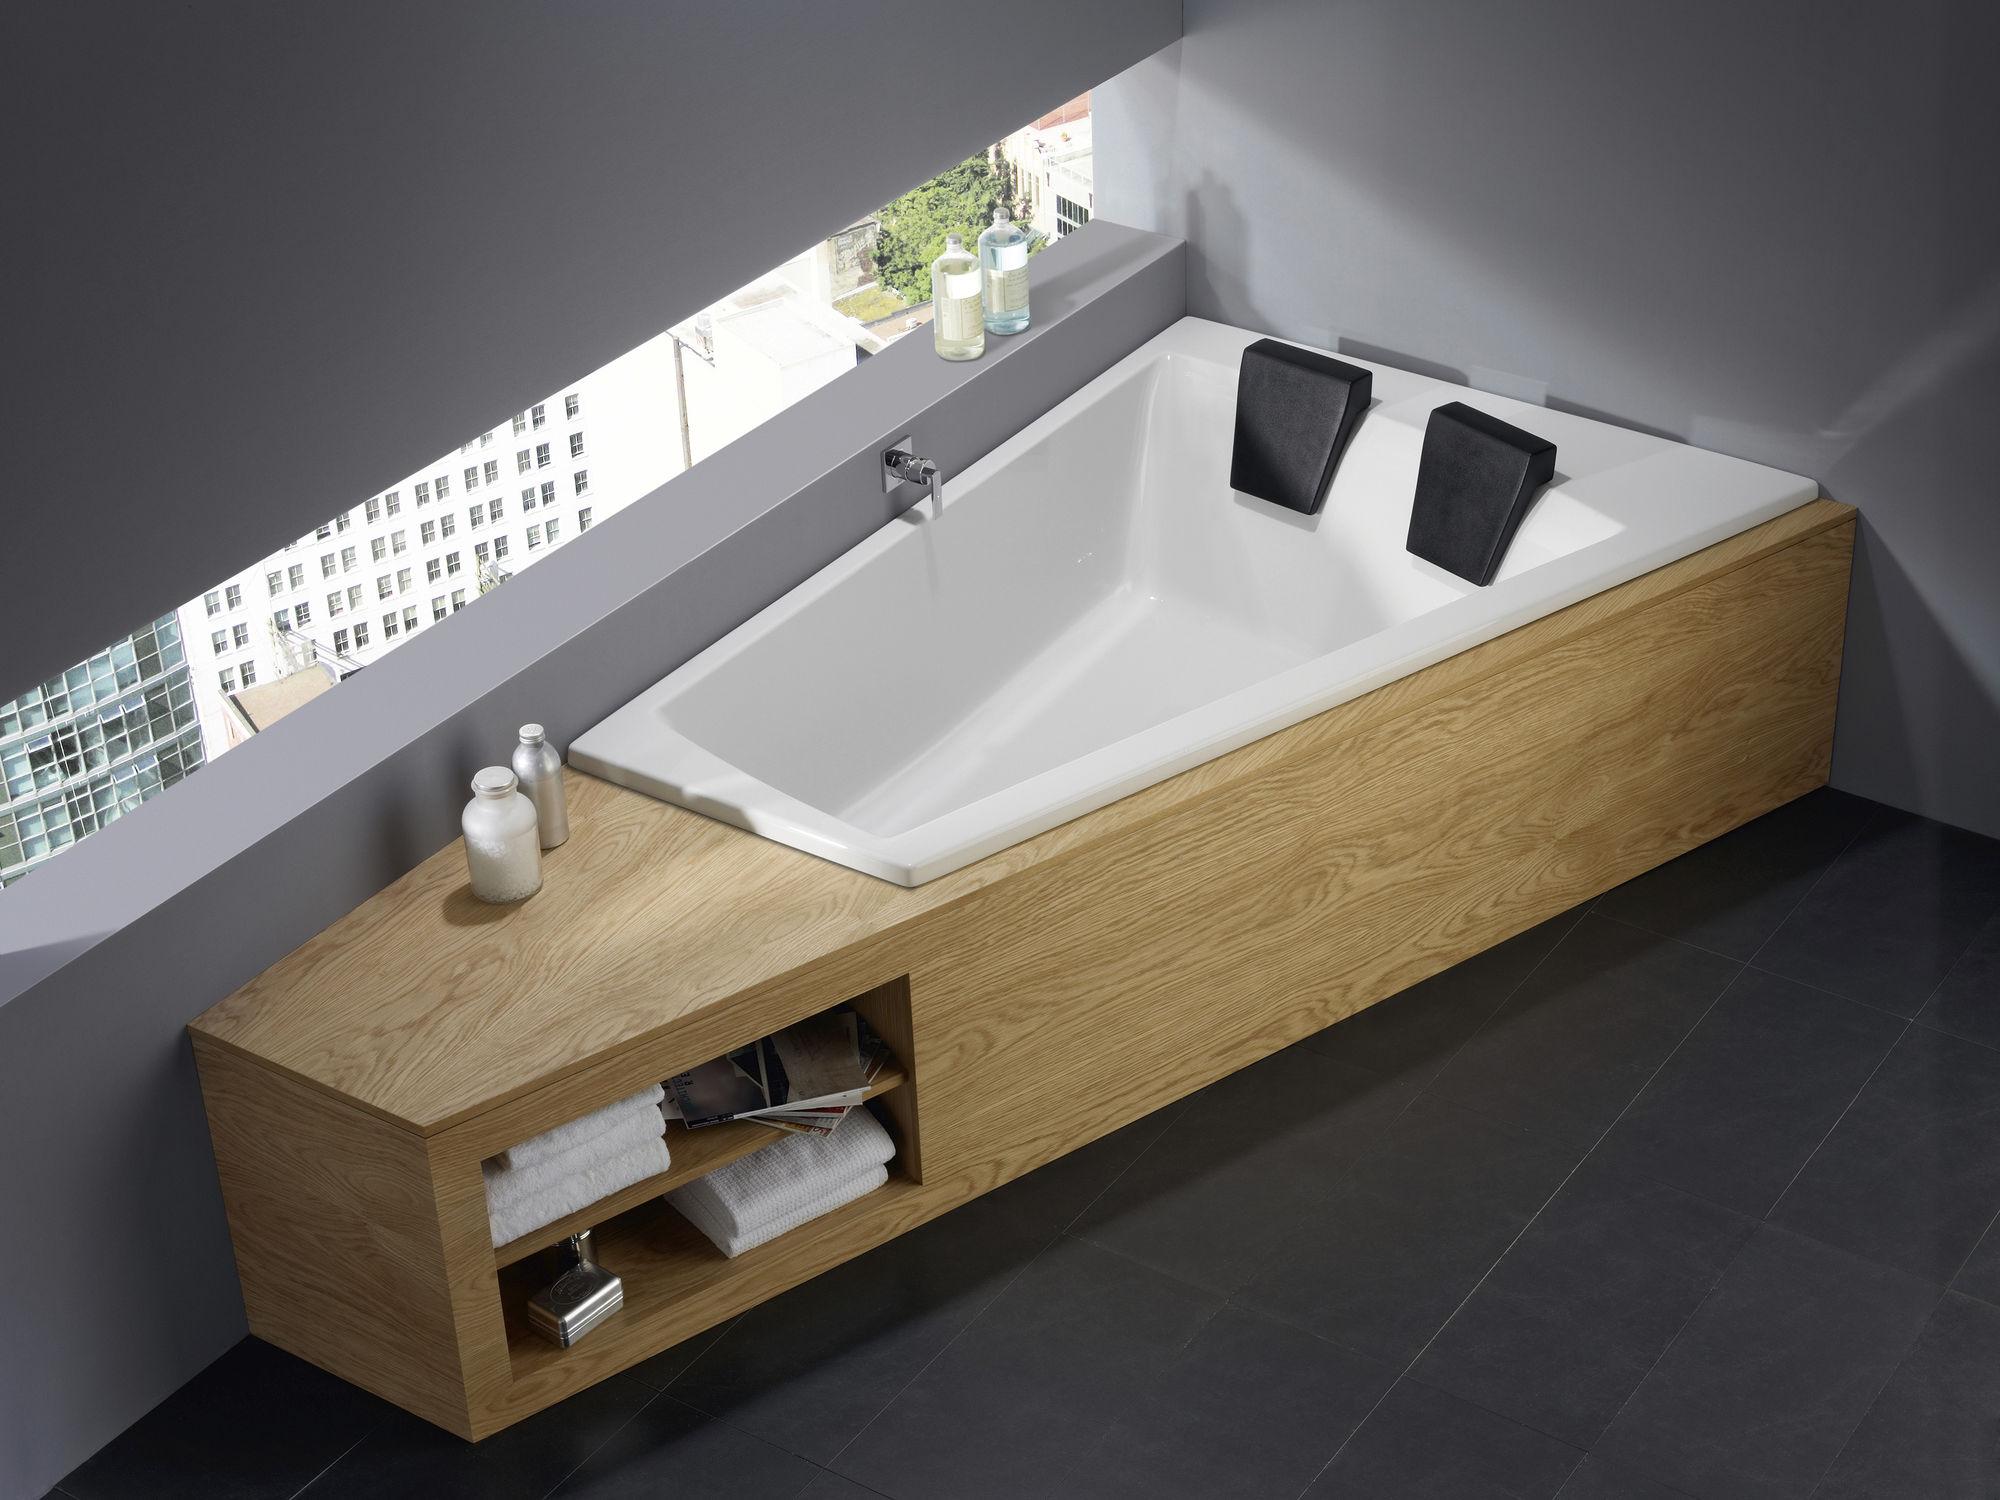 Built-in bathtub / corner / acrylic - GENF DUO 170/180 - Repabad ...